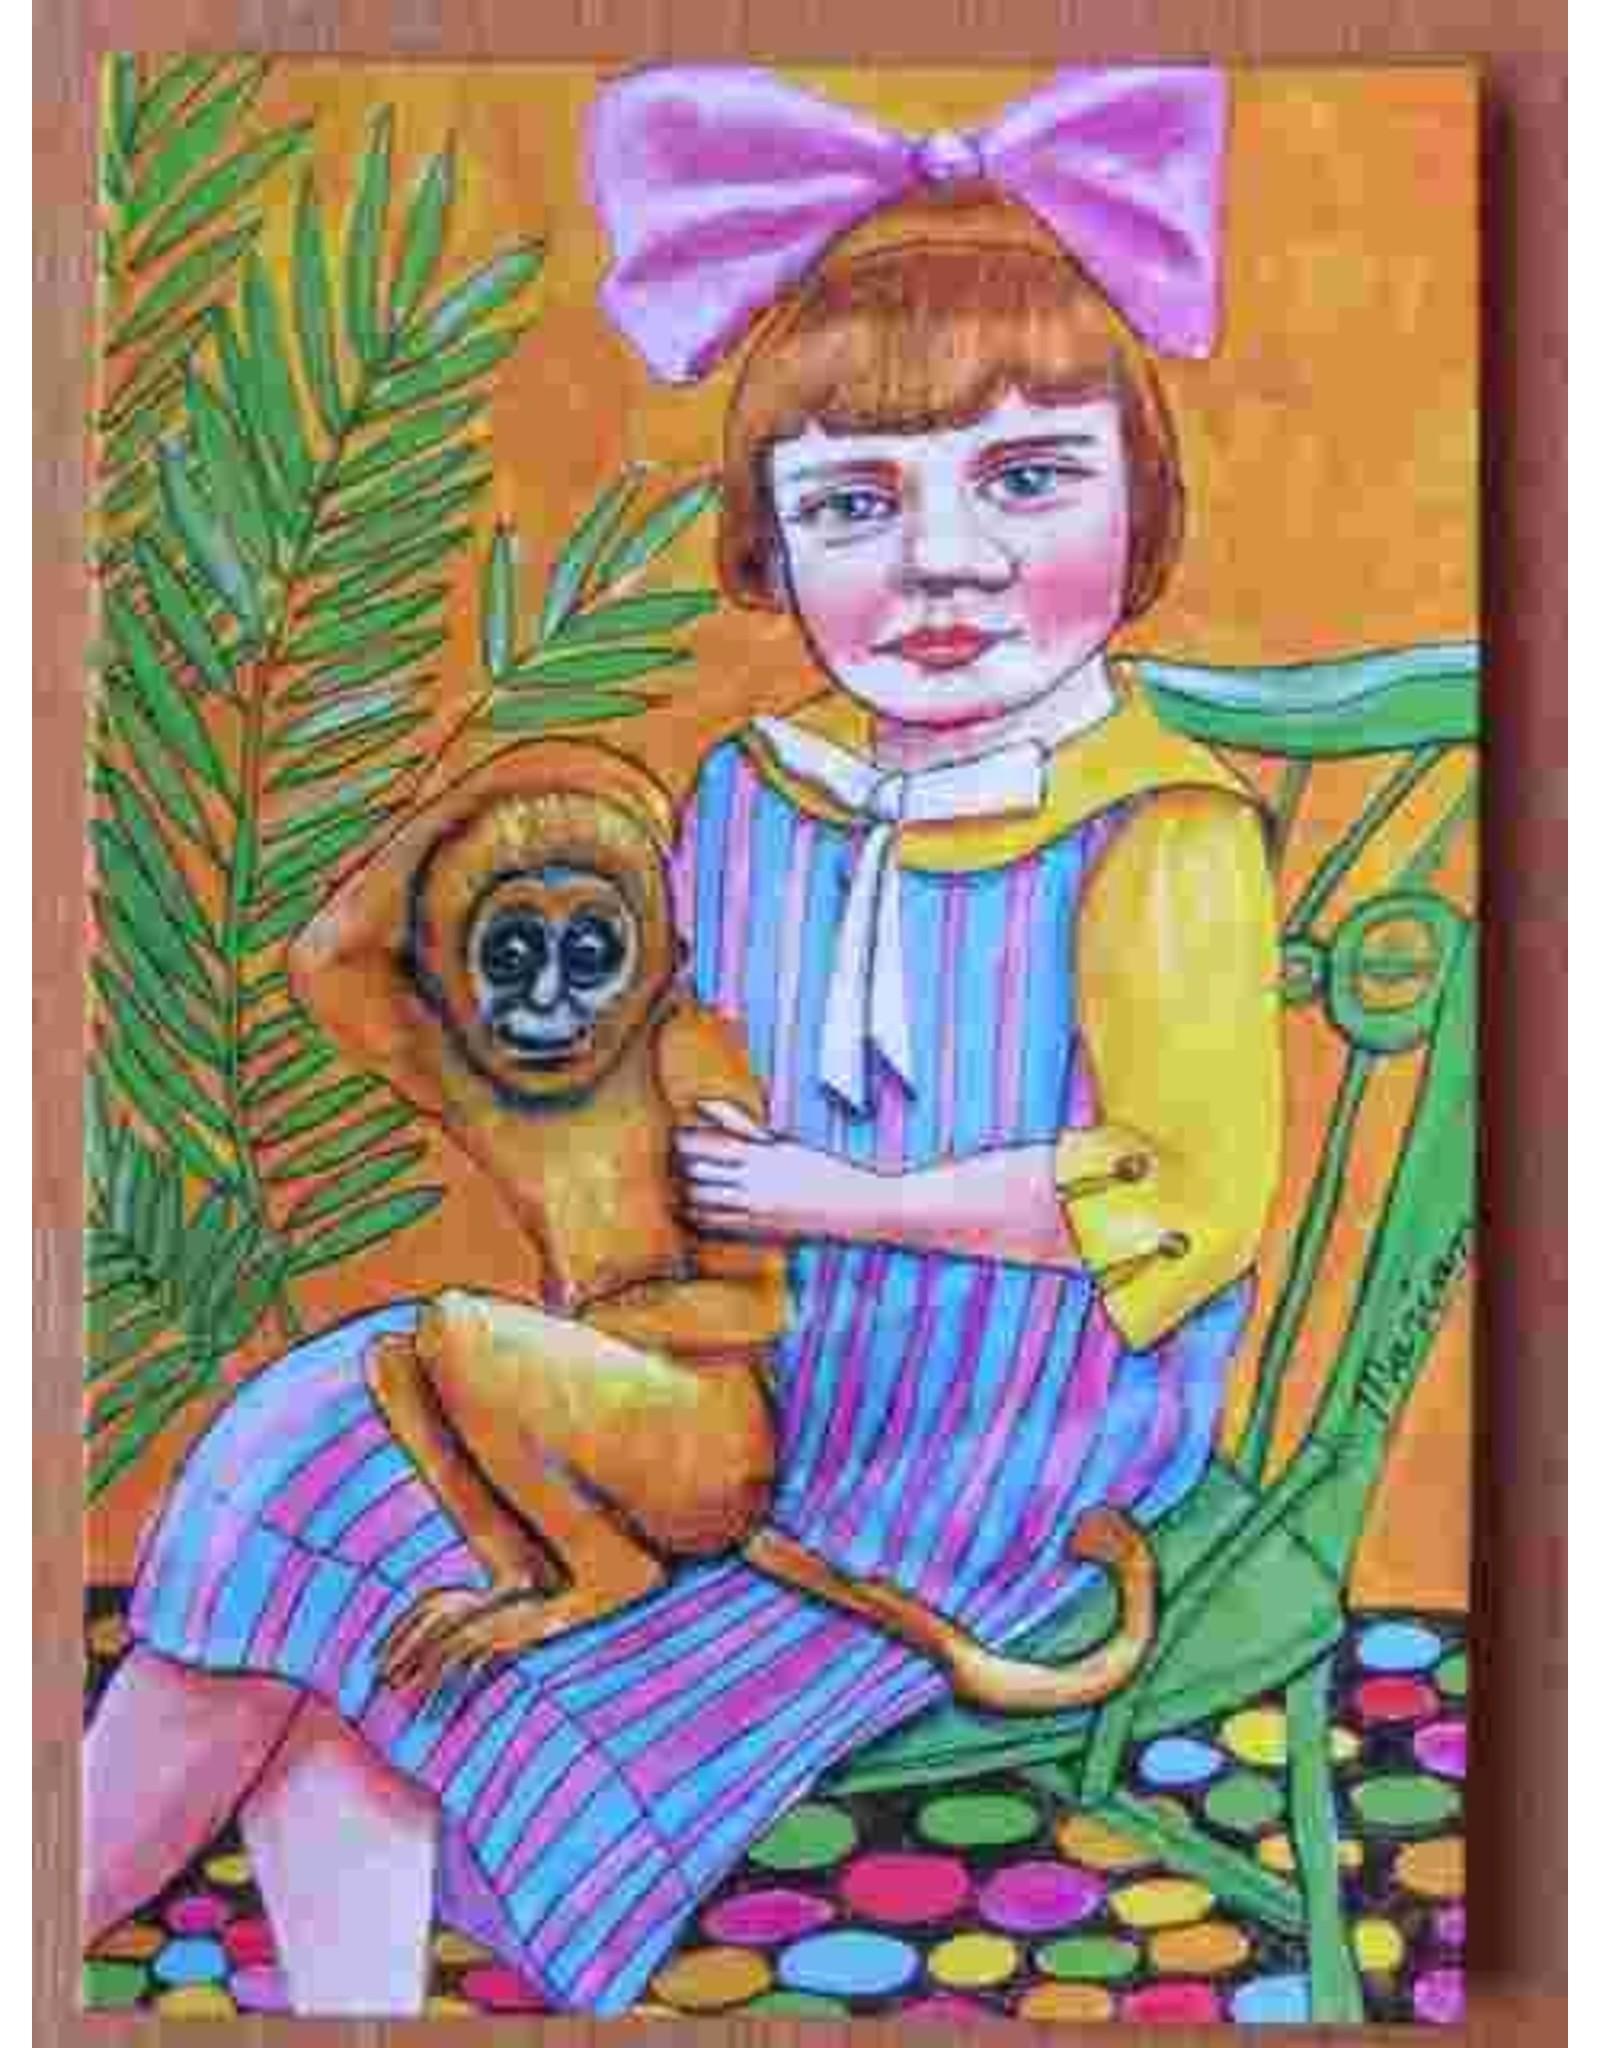 Art card - Girl with monkey